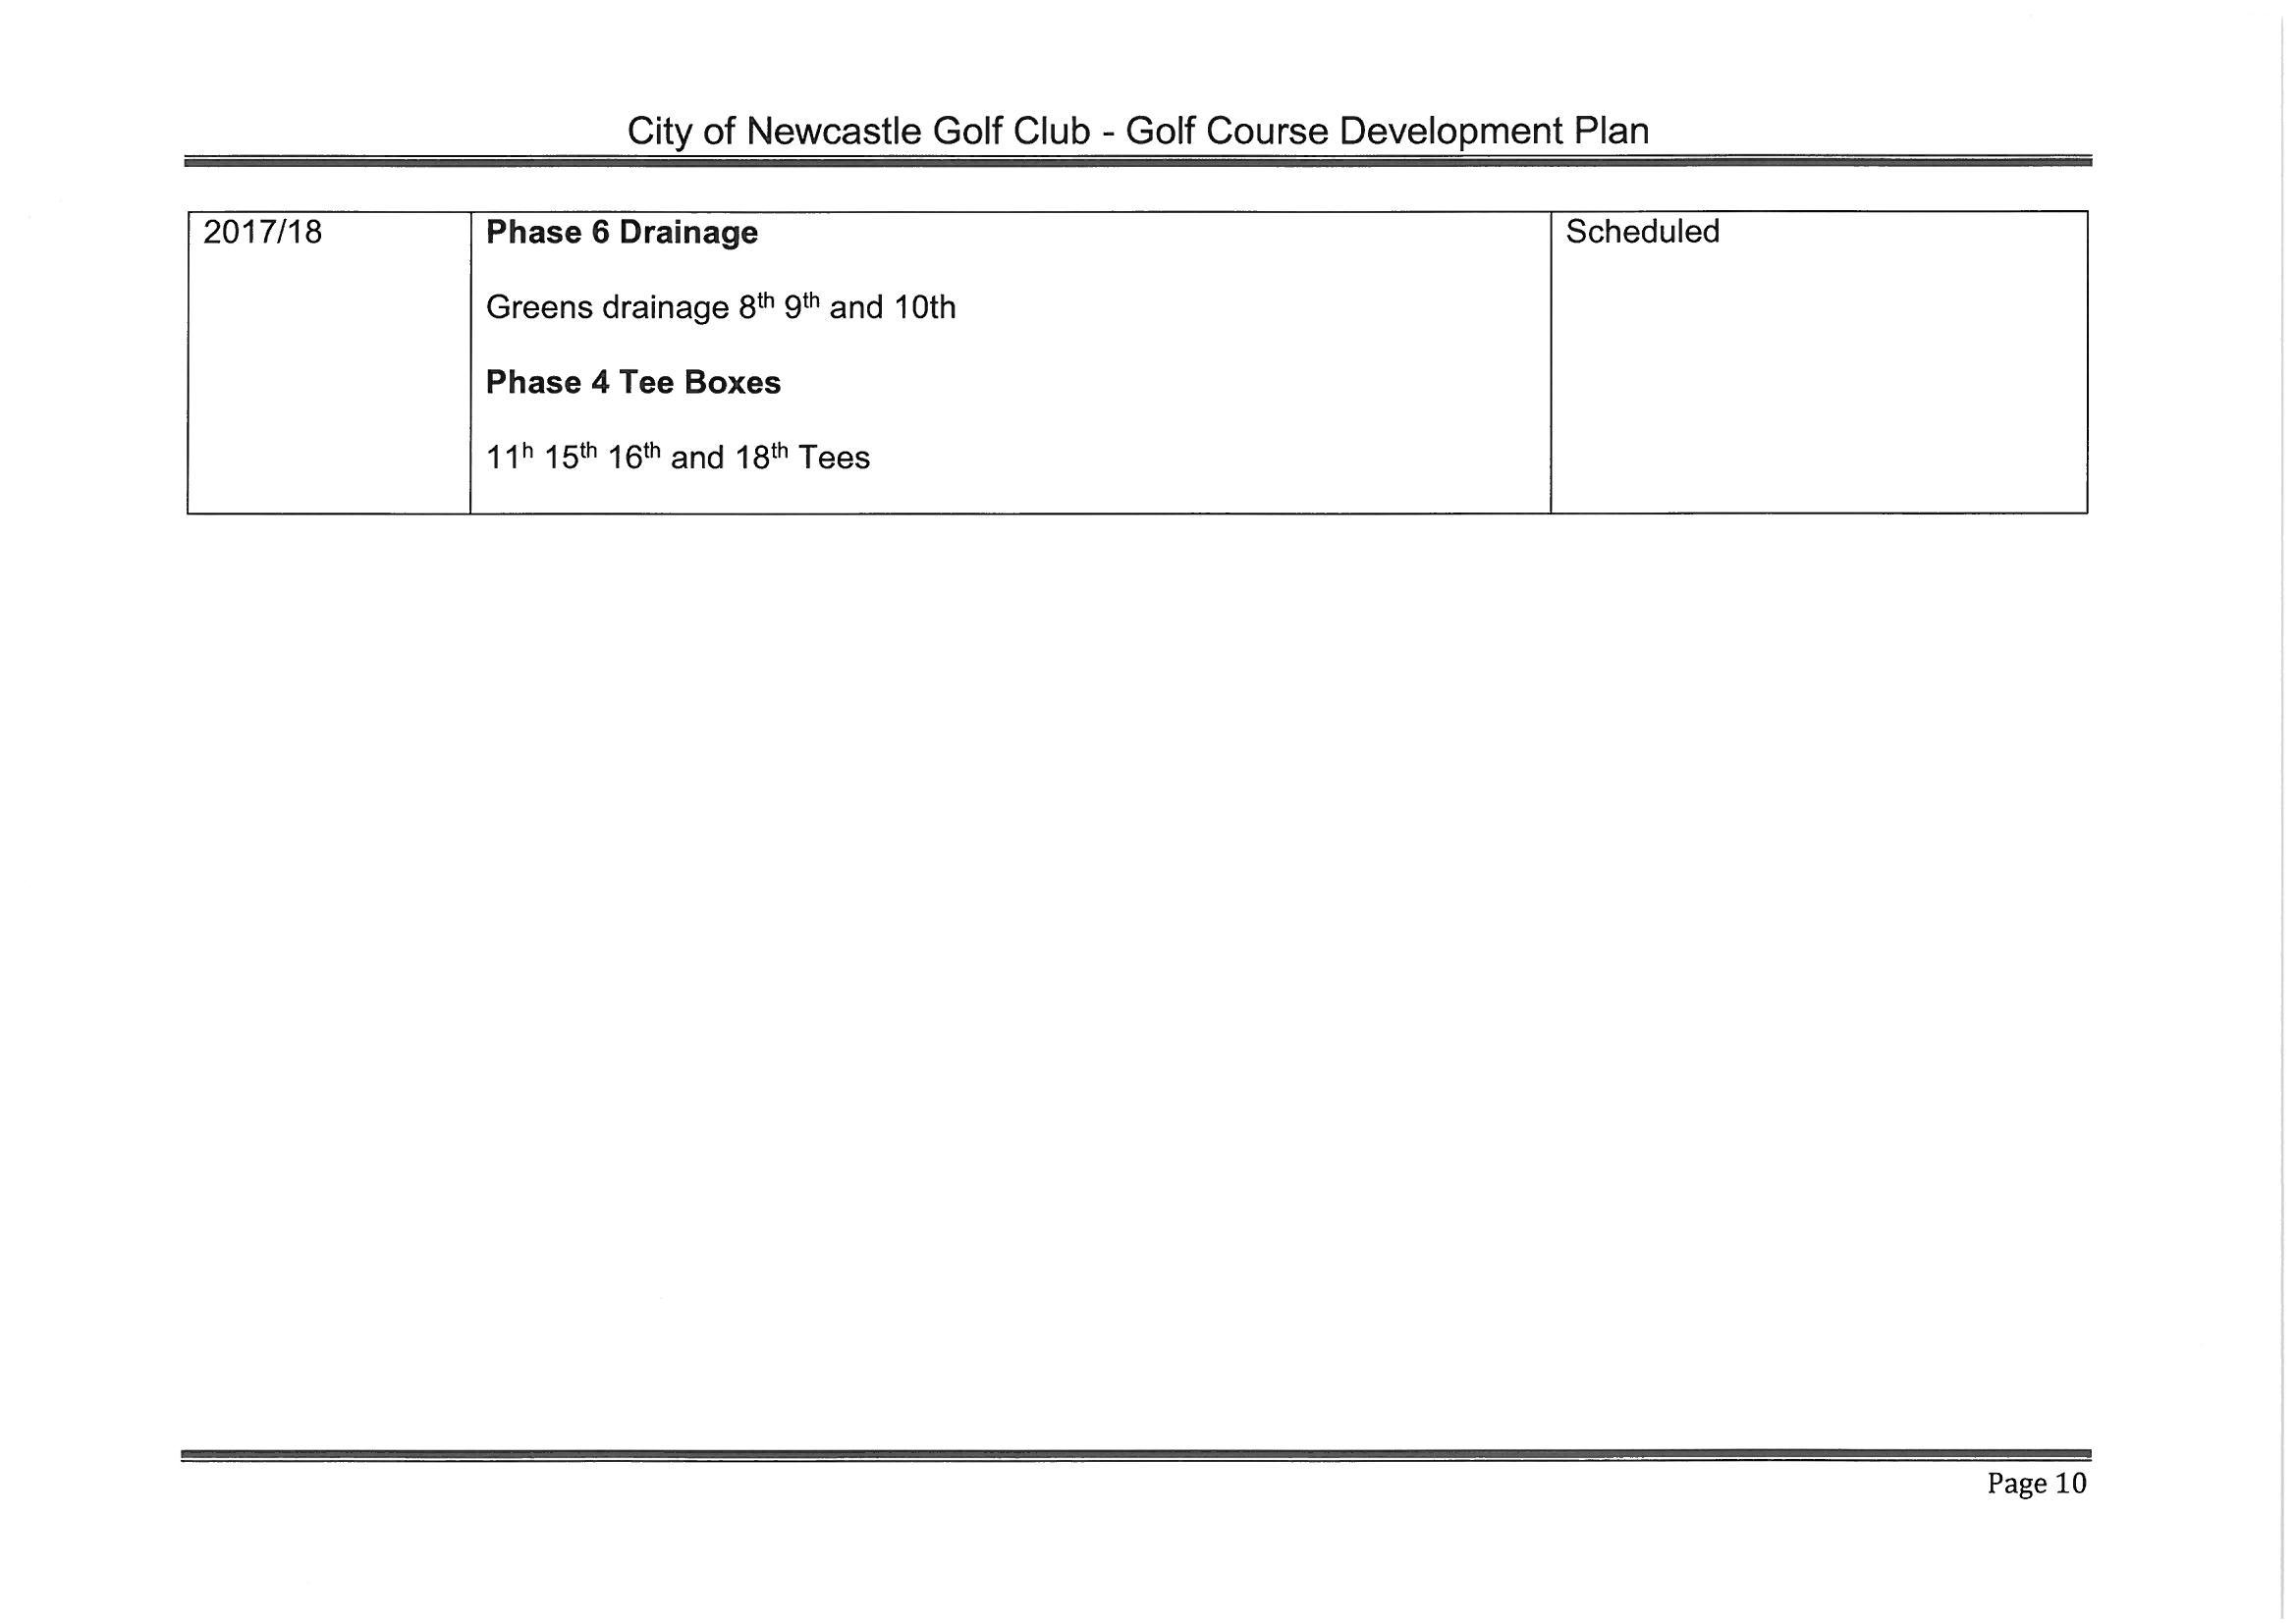 course development plan 10